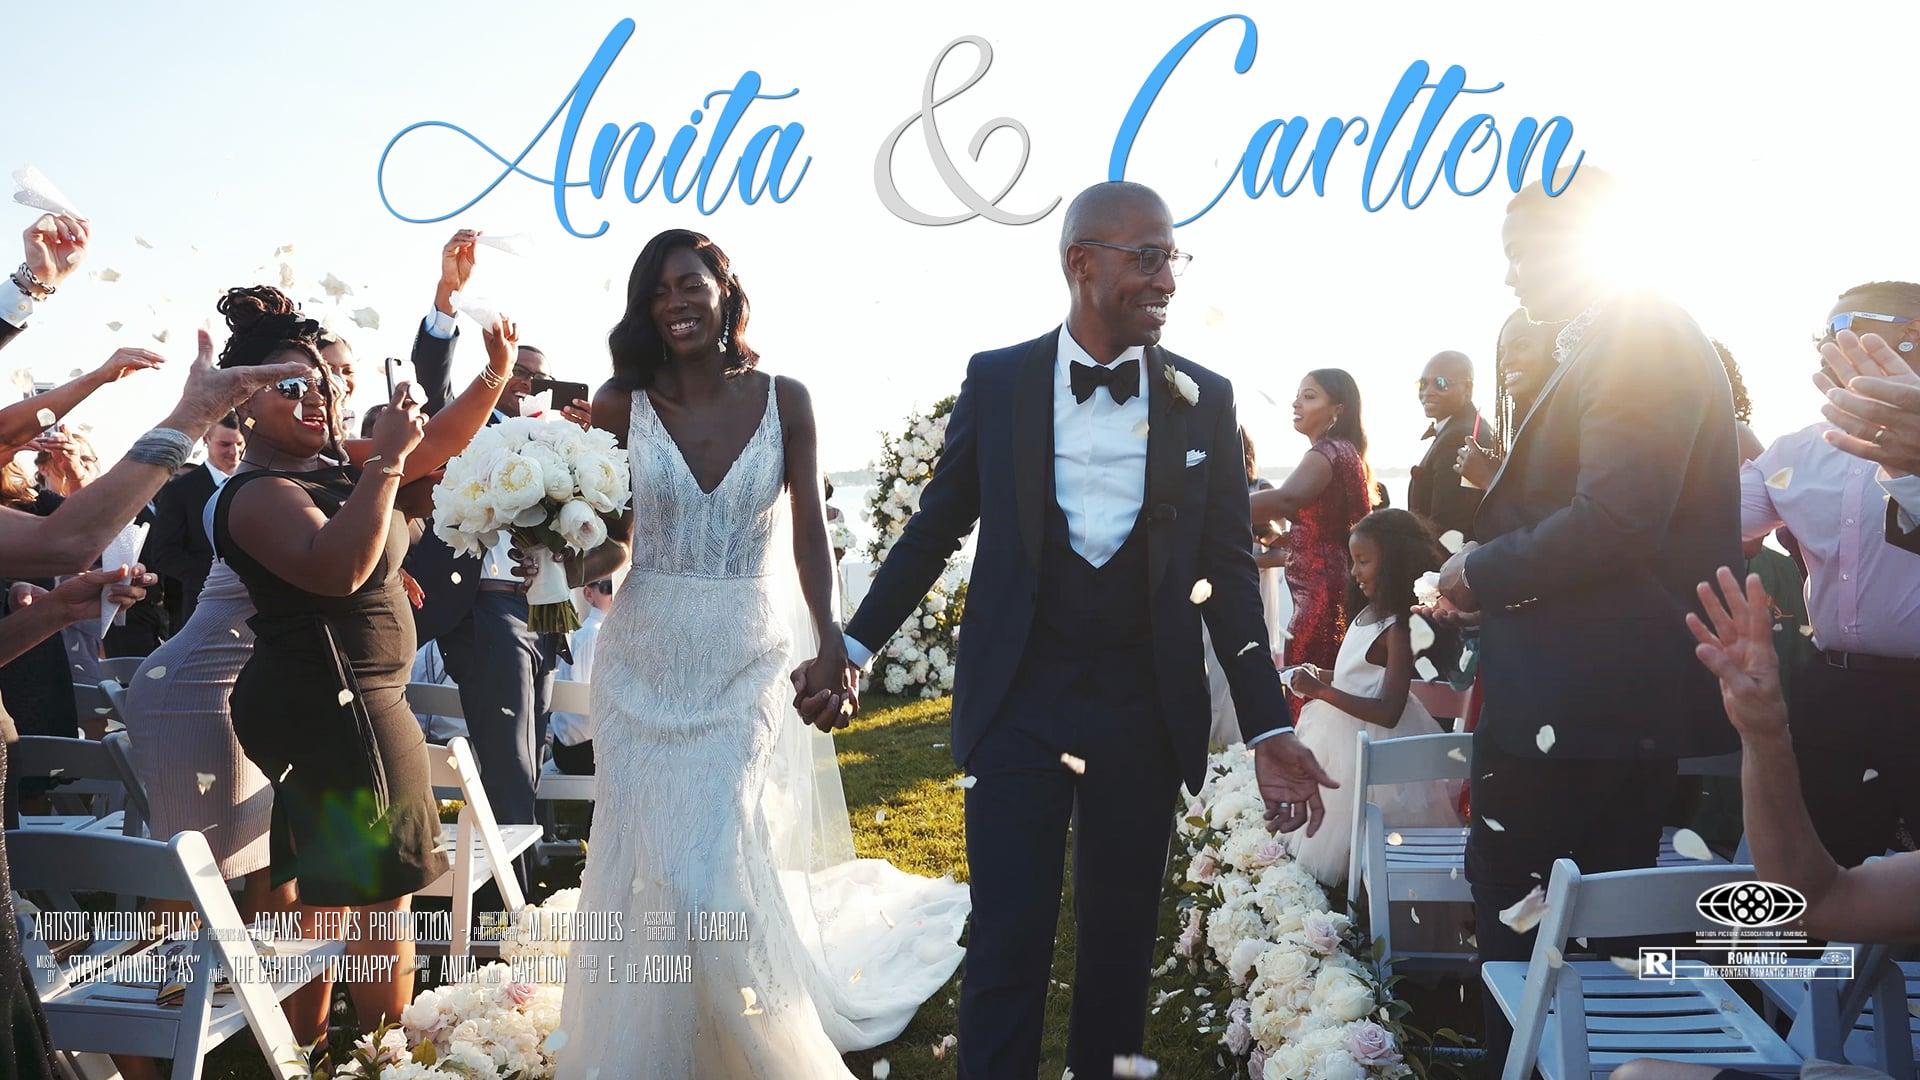 Belle Mer Wedding // Anita & Carlton's Wedding Highlight Film